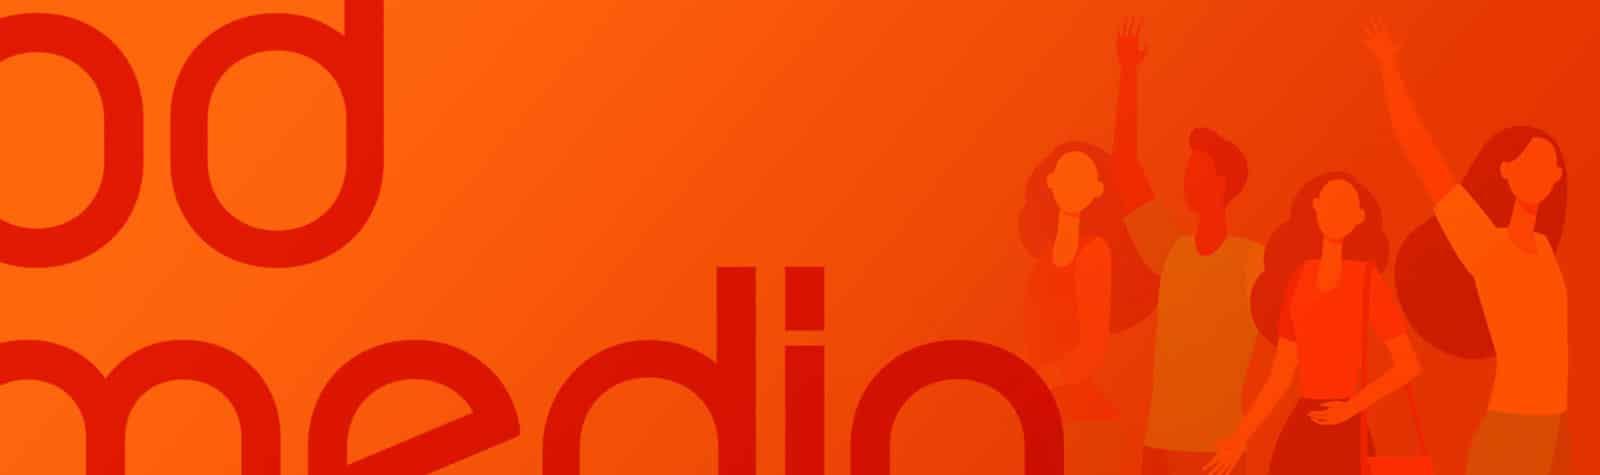 ODMedia and social media platform BuzzShow Network partner to create a video NFT marketplace